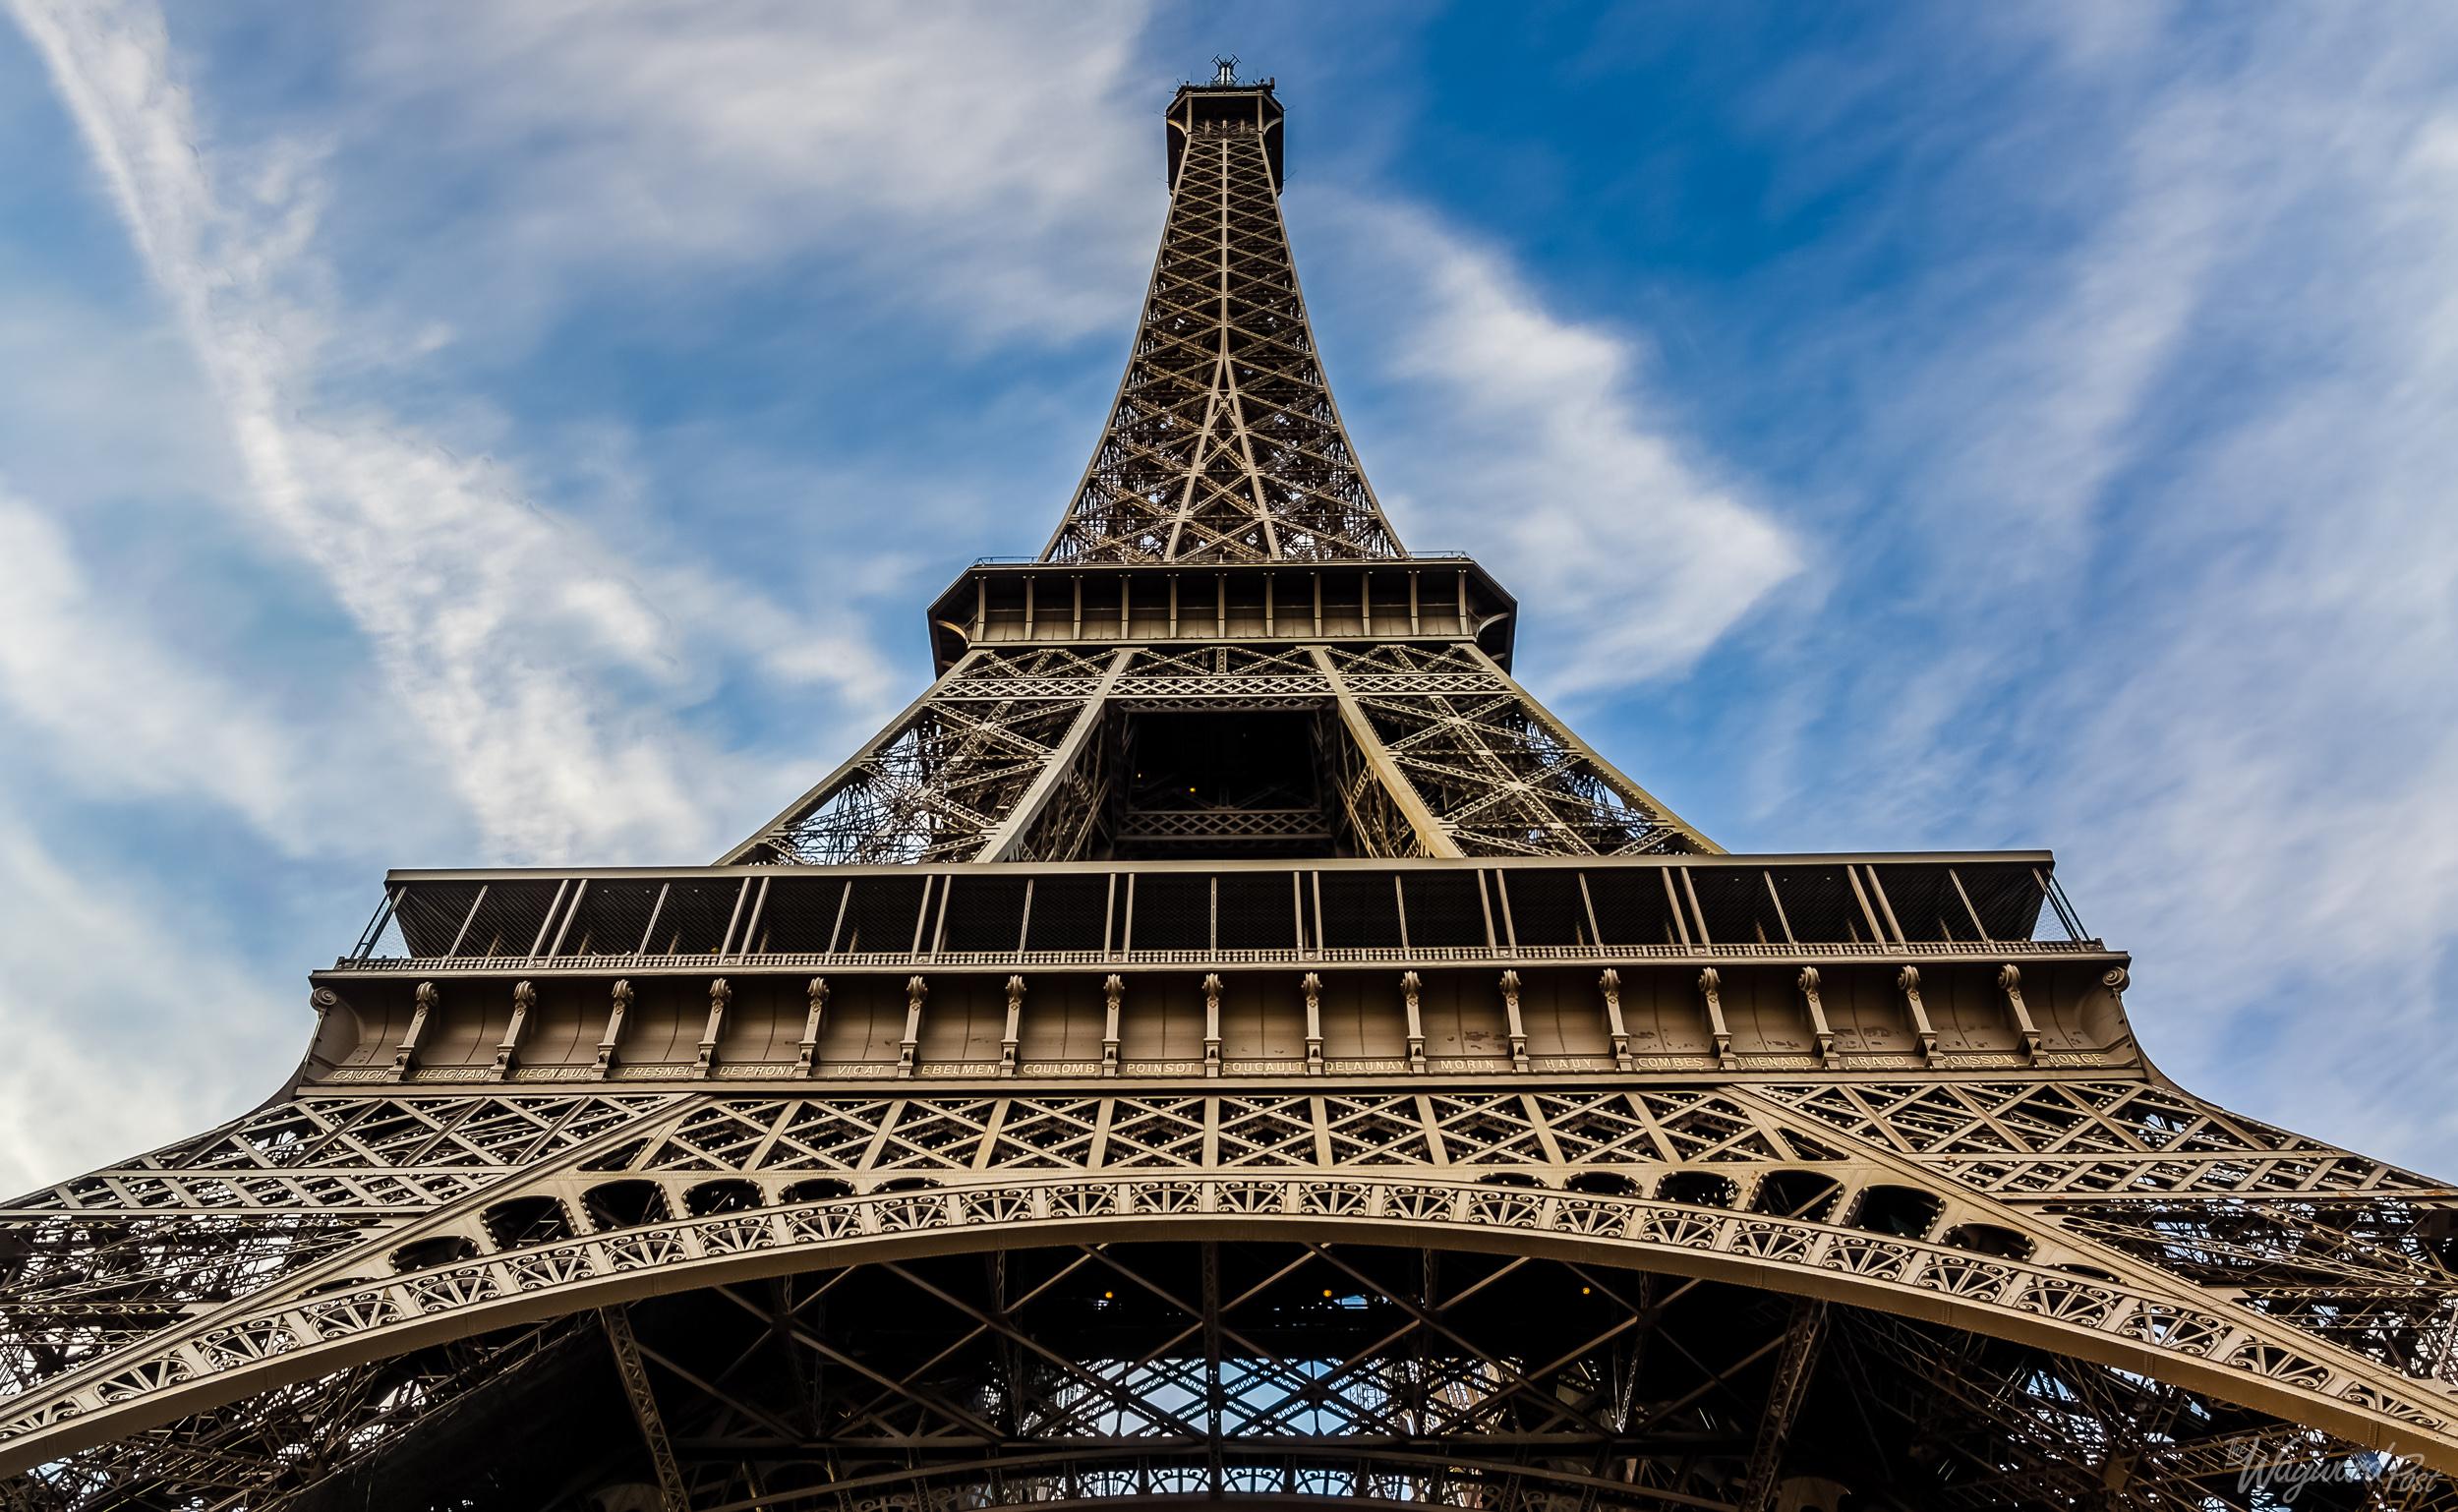 Eiffel Tower,Paris, France, The Wayward Post